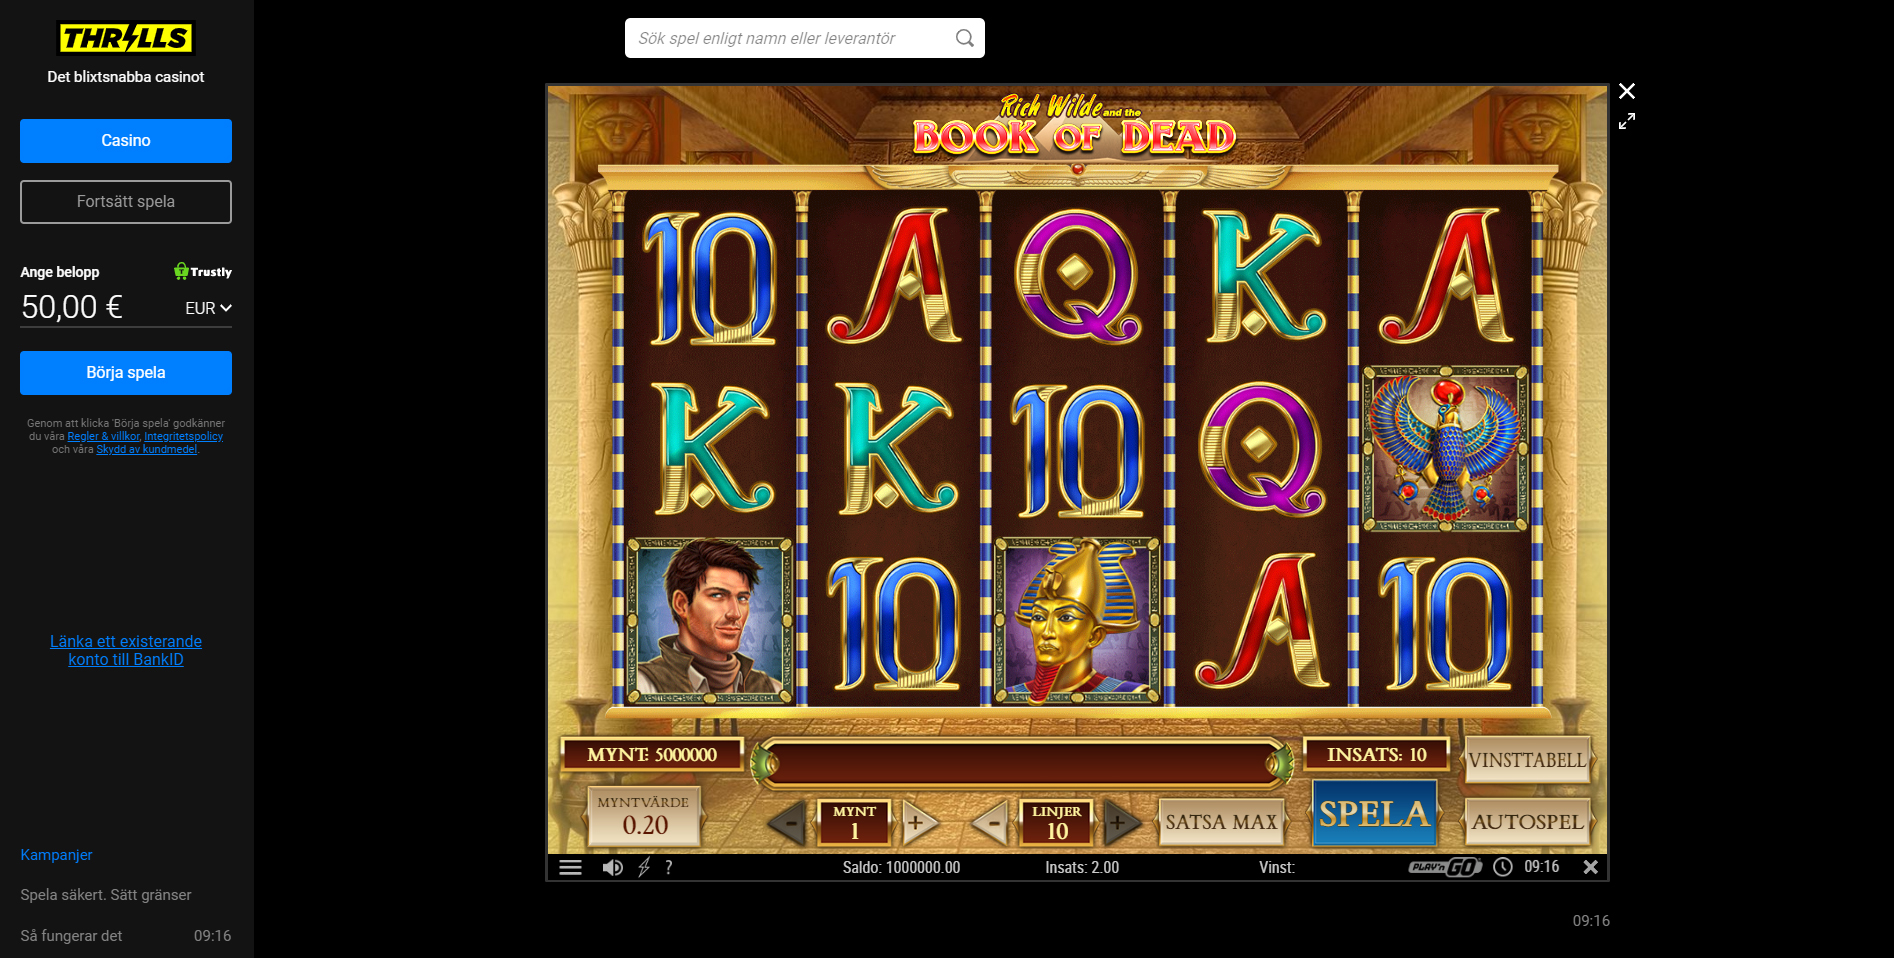 Speedy casino recension Euteller Leck